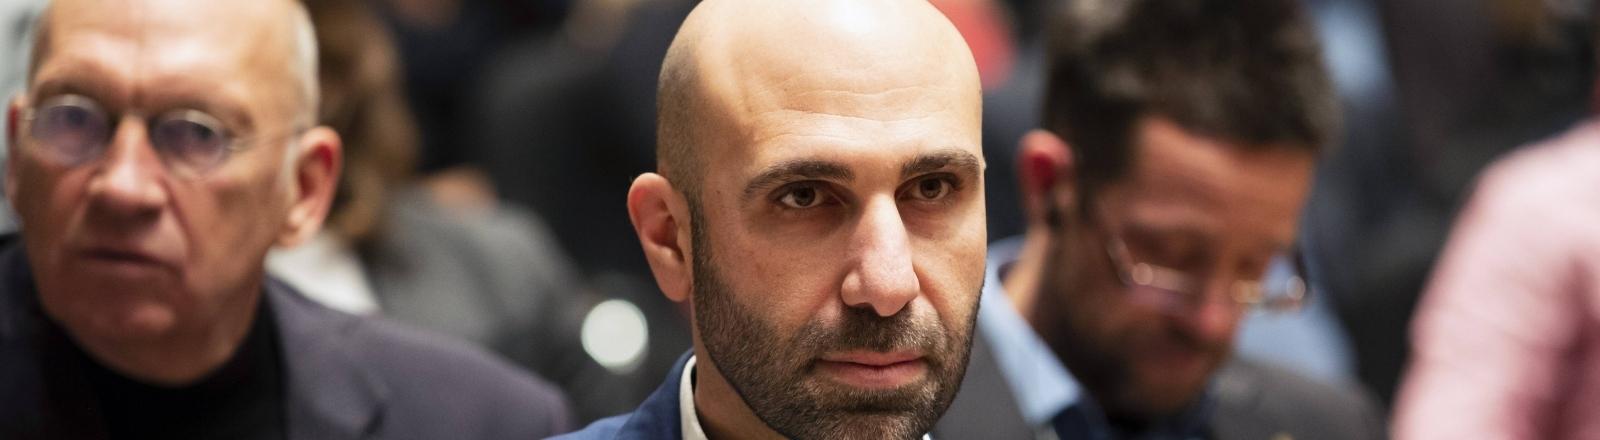 Ahmad Mansour, Psychologe und Islamismusexperte